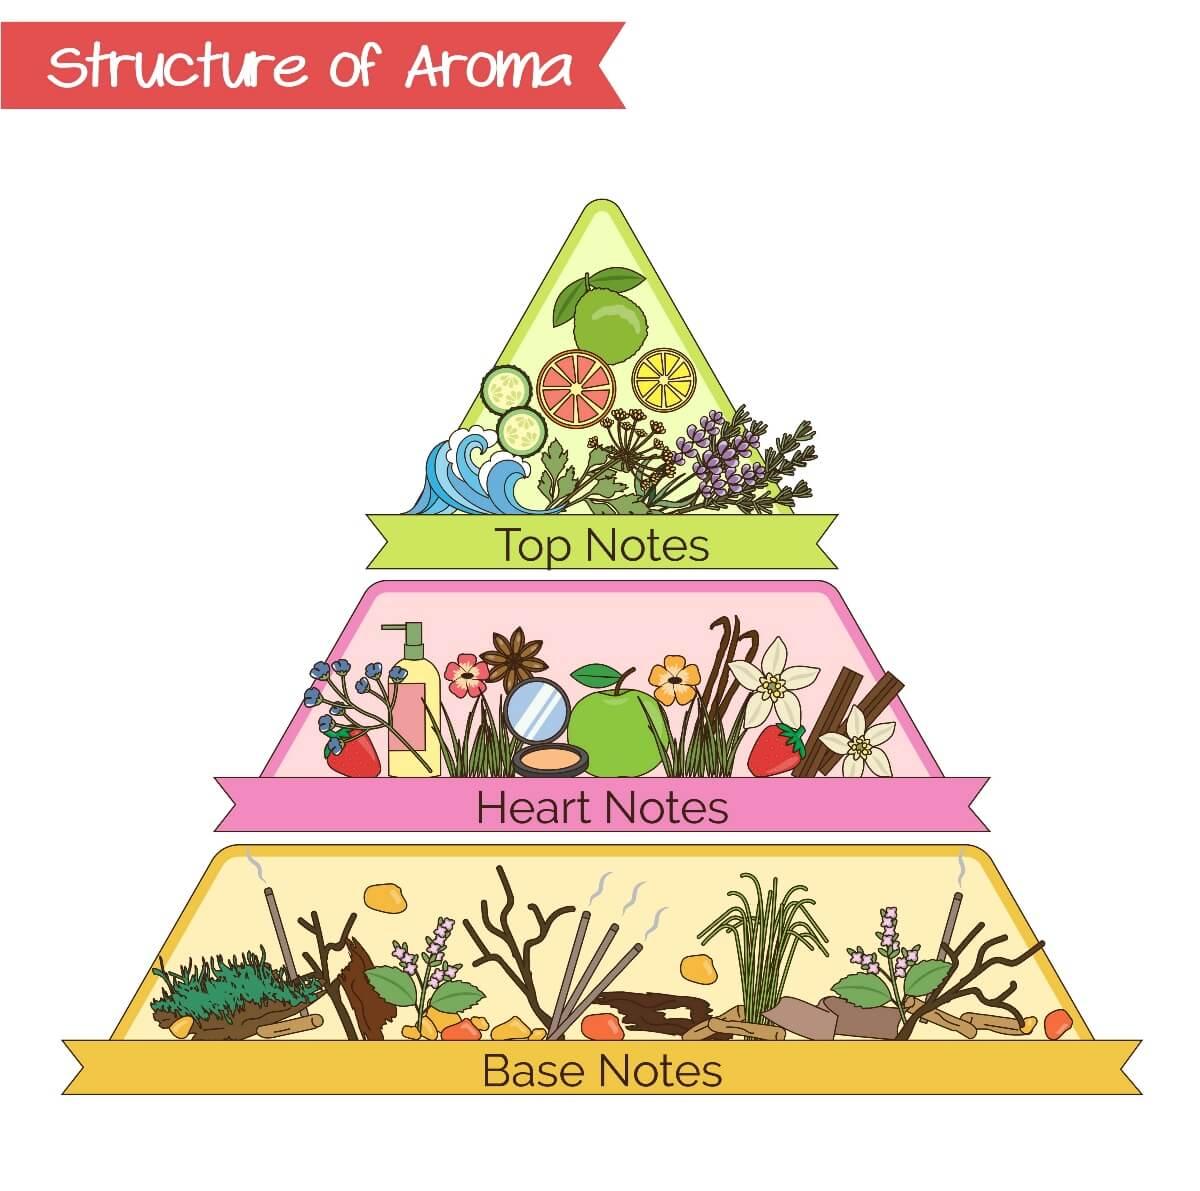 aroma structure triangle pyramid